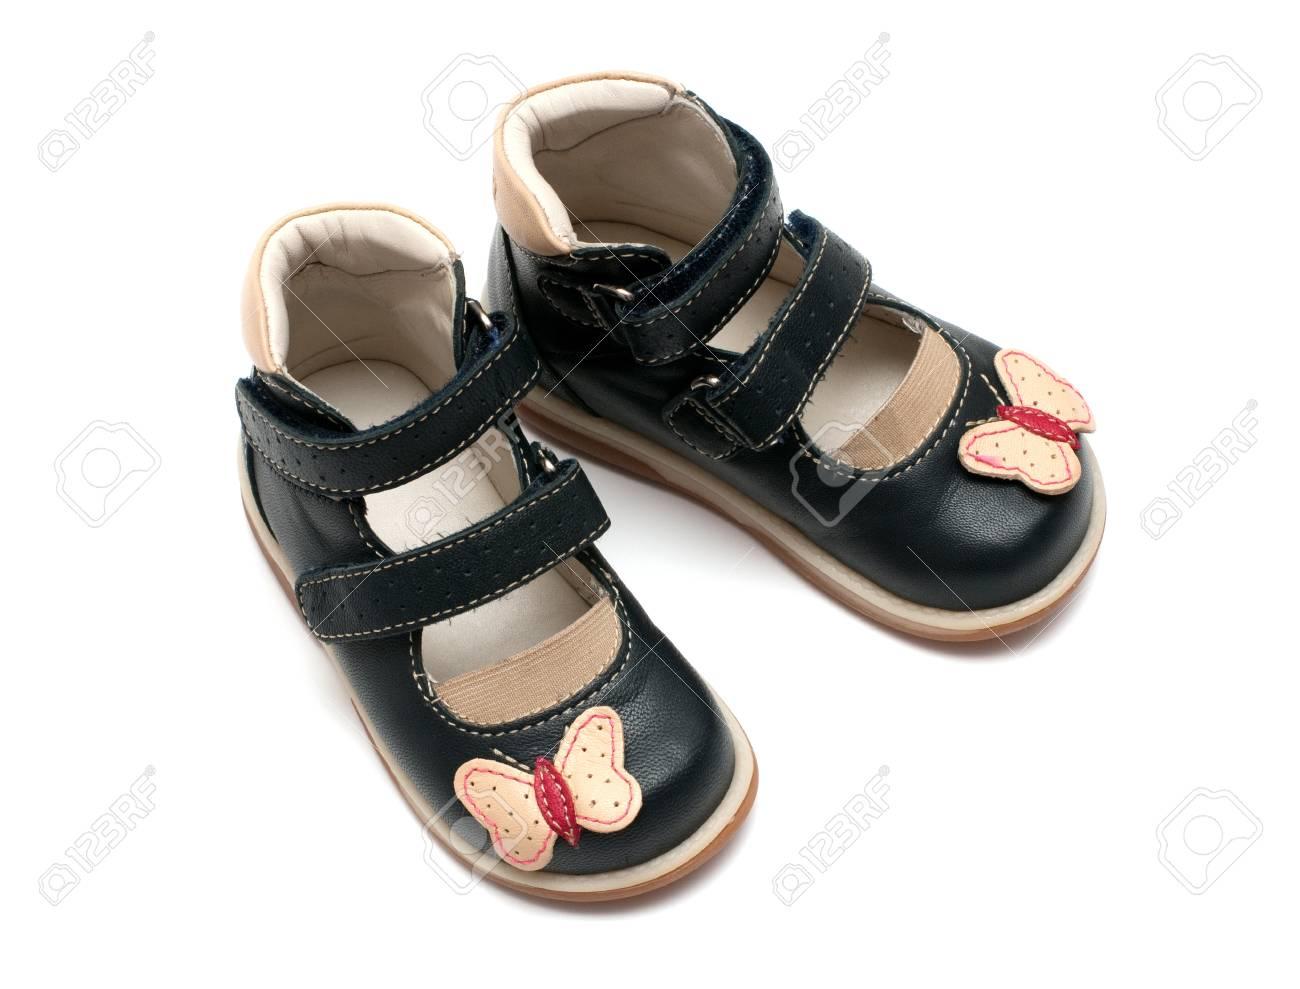 7b6c2b68 Un Par De Zapatos Ortopedicos Un Nino Aislado En Blanco Fotos. Save. Venta Calzado  Ortopedico Avi Youtube